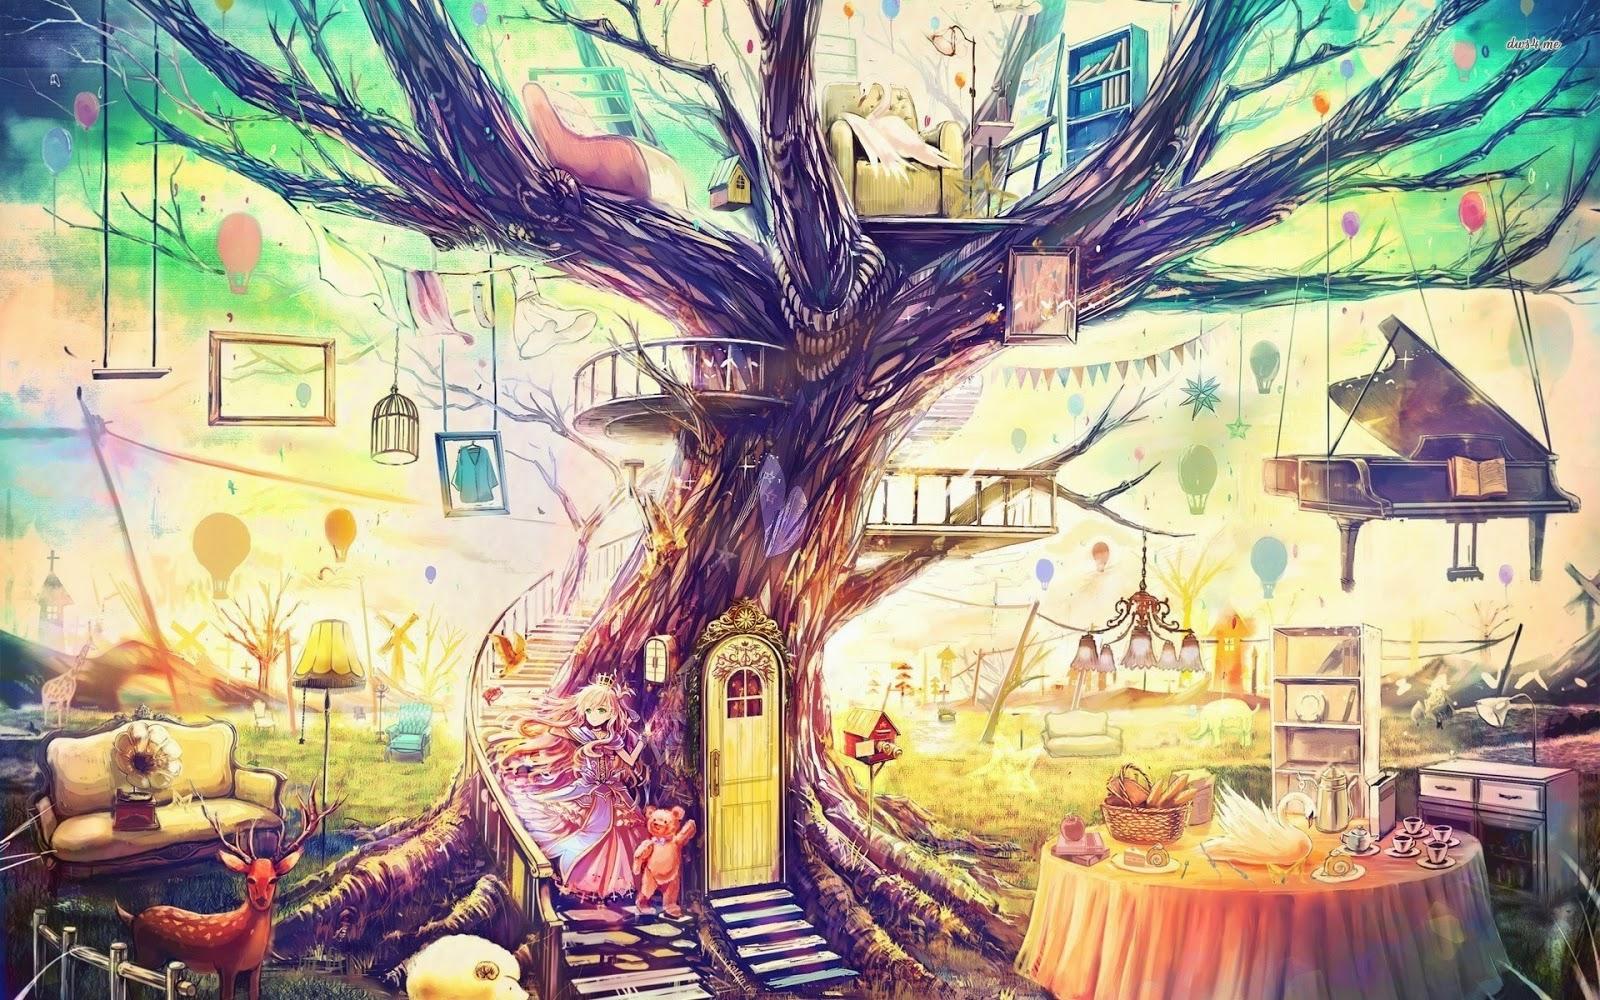 Innovative-creation-tree-house-design-fantasy-people-design-image-HD-1920x1200.jpg